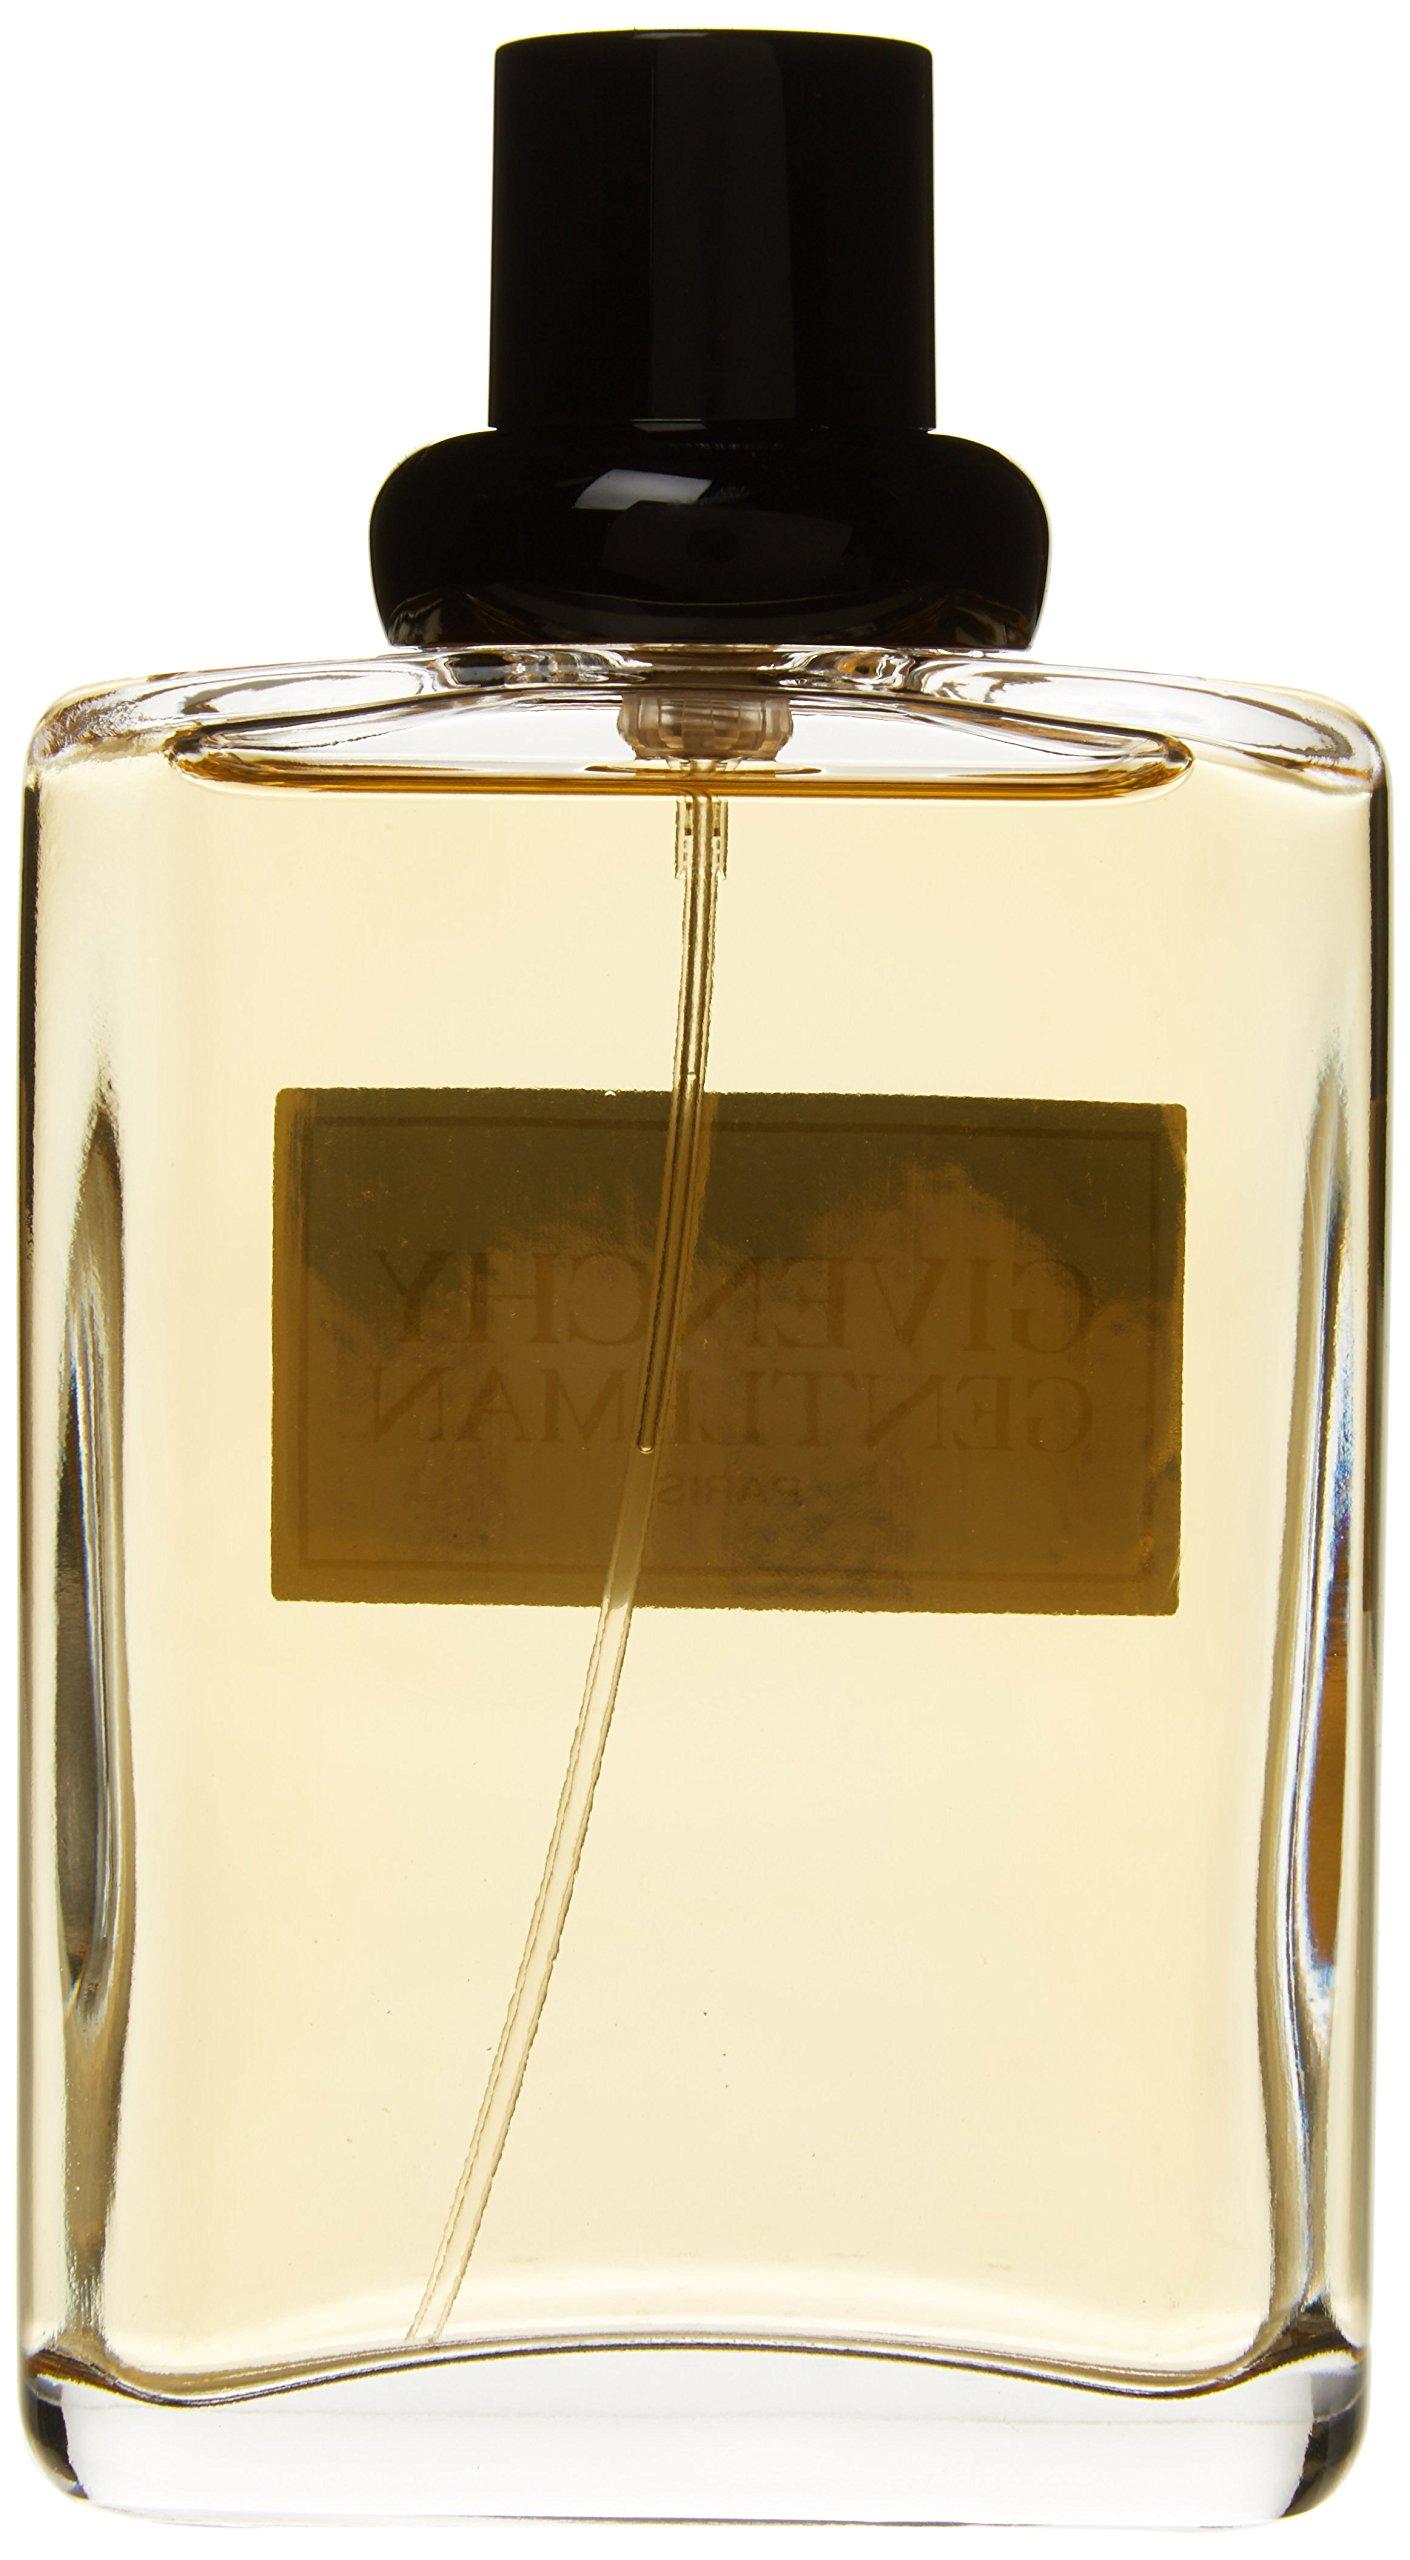 Gentleman/Givenchy Edt Spray 3.3 Oz (100 Ml) (M)